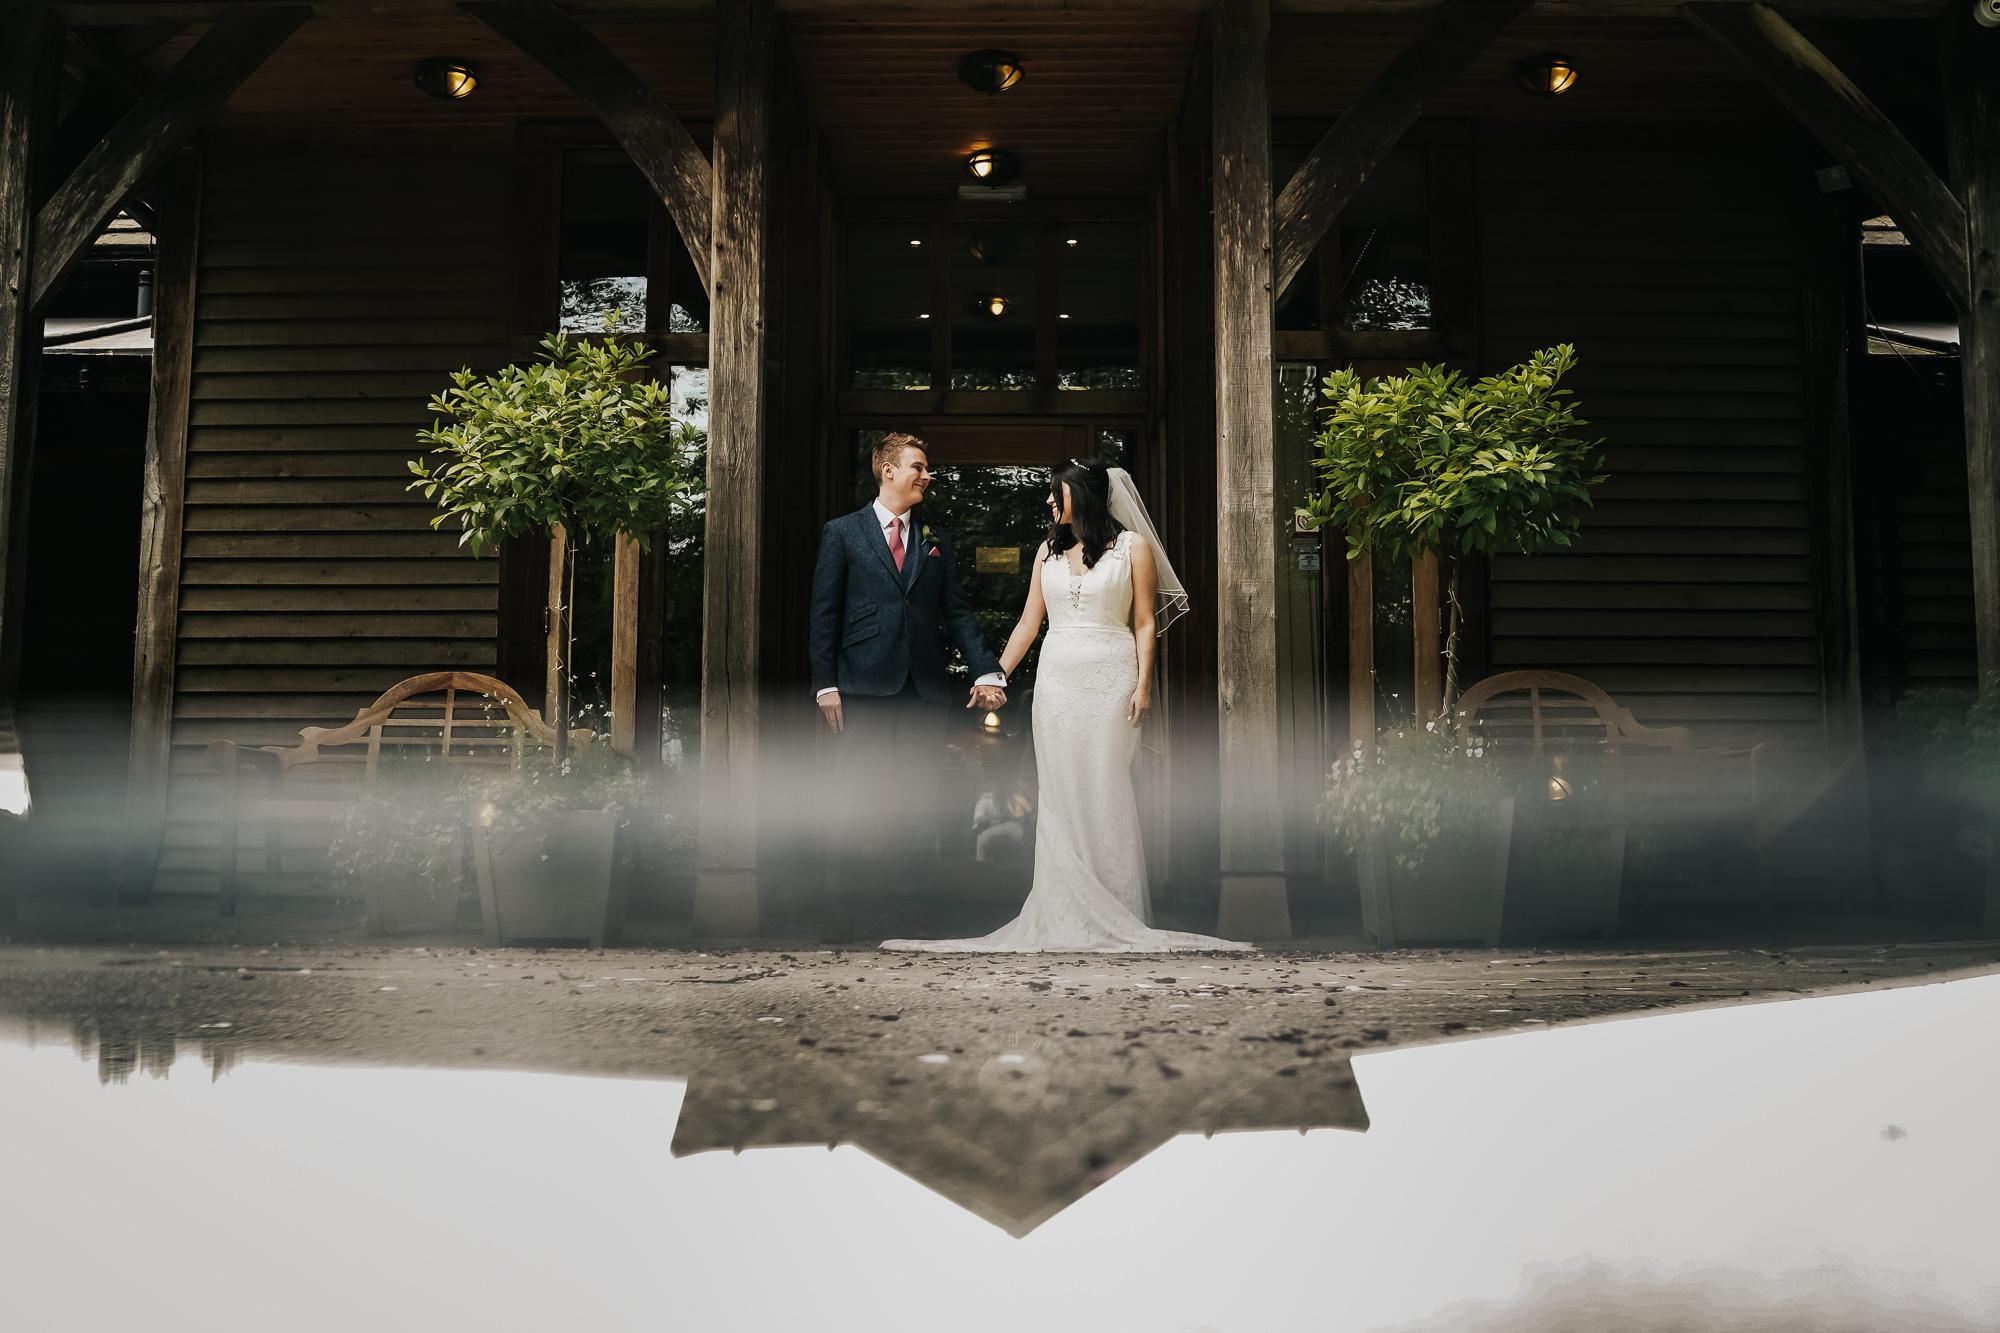 Oak tree of peover wedding photography cheshire wedding photographer (40 of 56).jpg